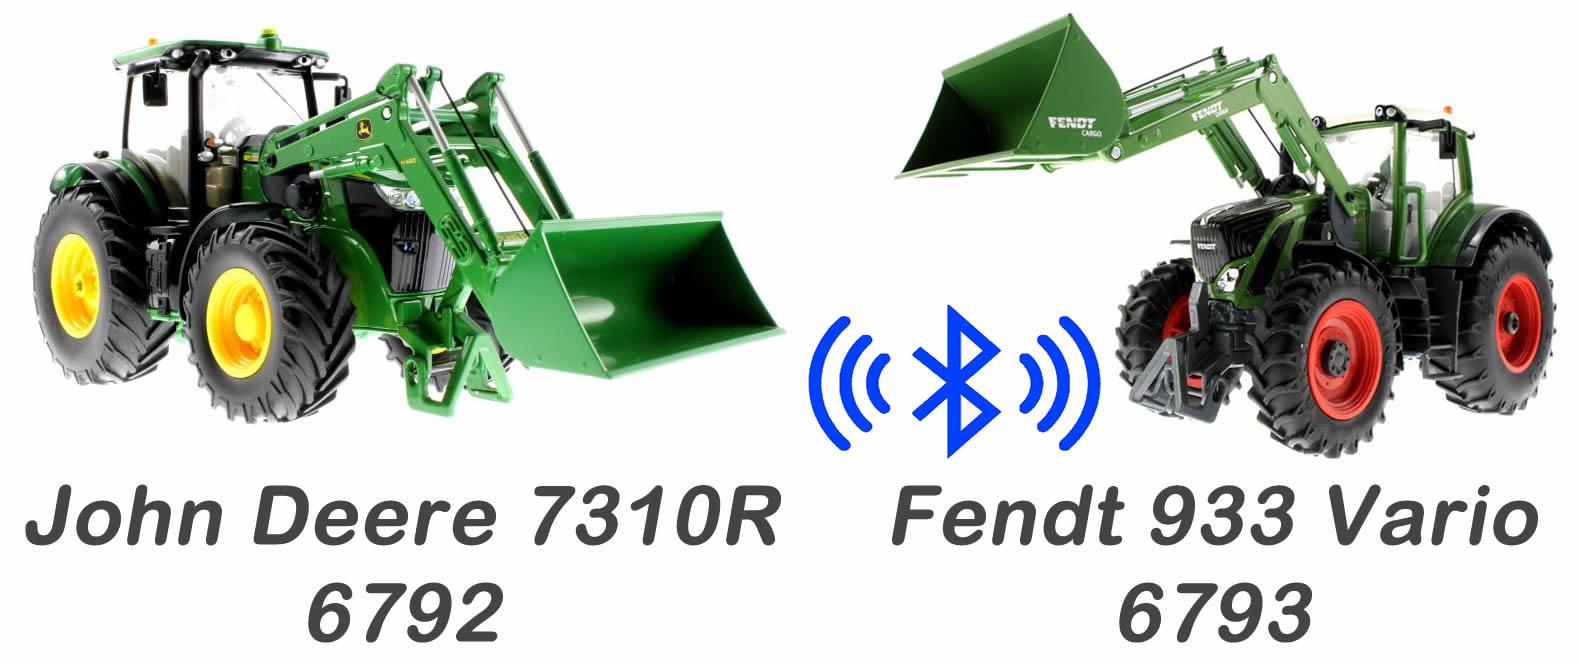 Siku 6793 - 6792 John Deere - Fendt 939 Vario mit Frontlader Bluetooth